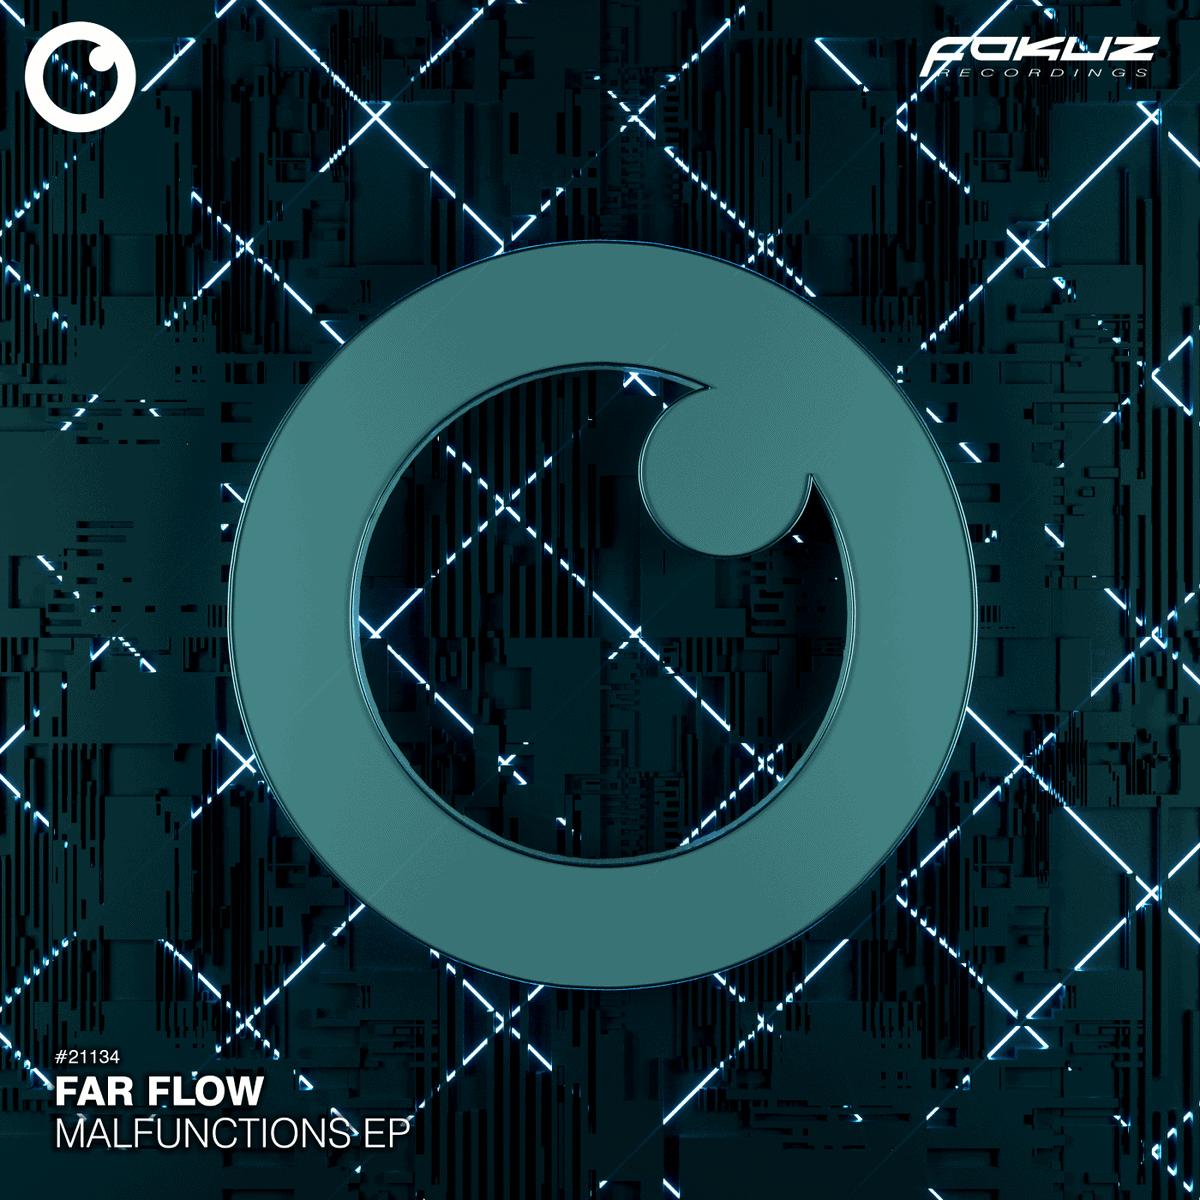 FOKUZ 21134 – Far Flow – Malfunctions EP 1400